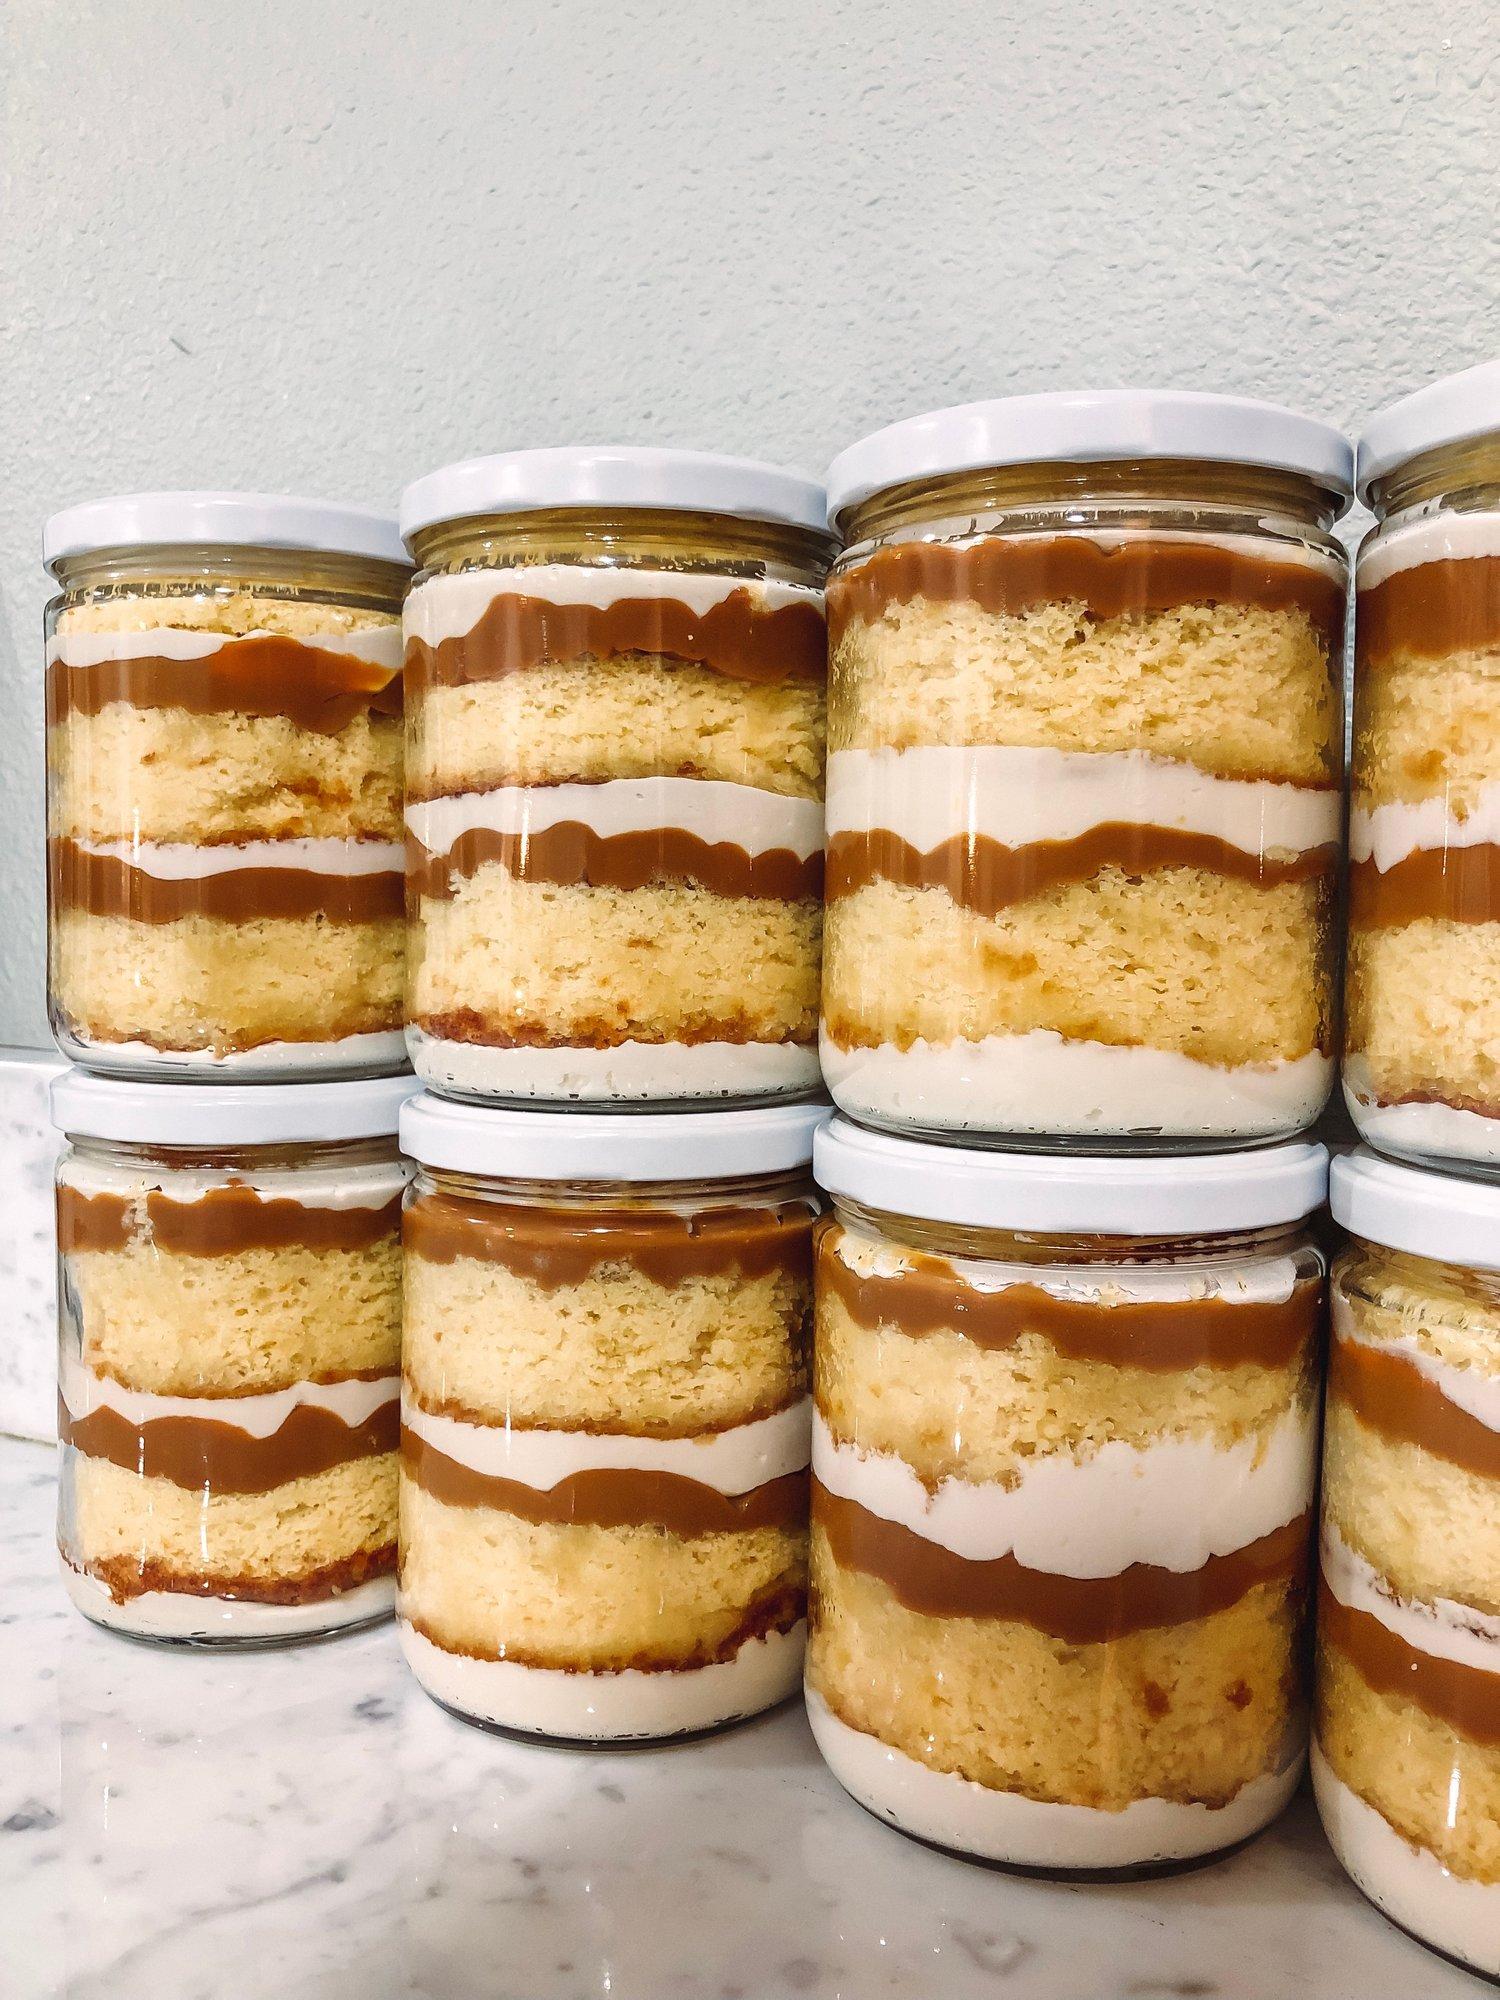 Elise S Pieces Tampa S Designer Cakes Treats